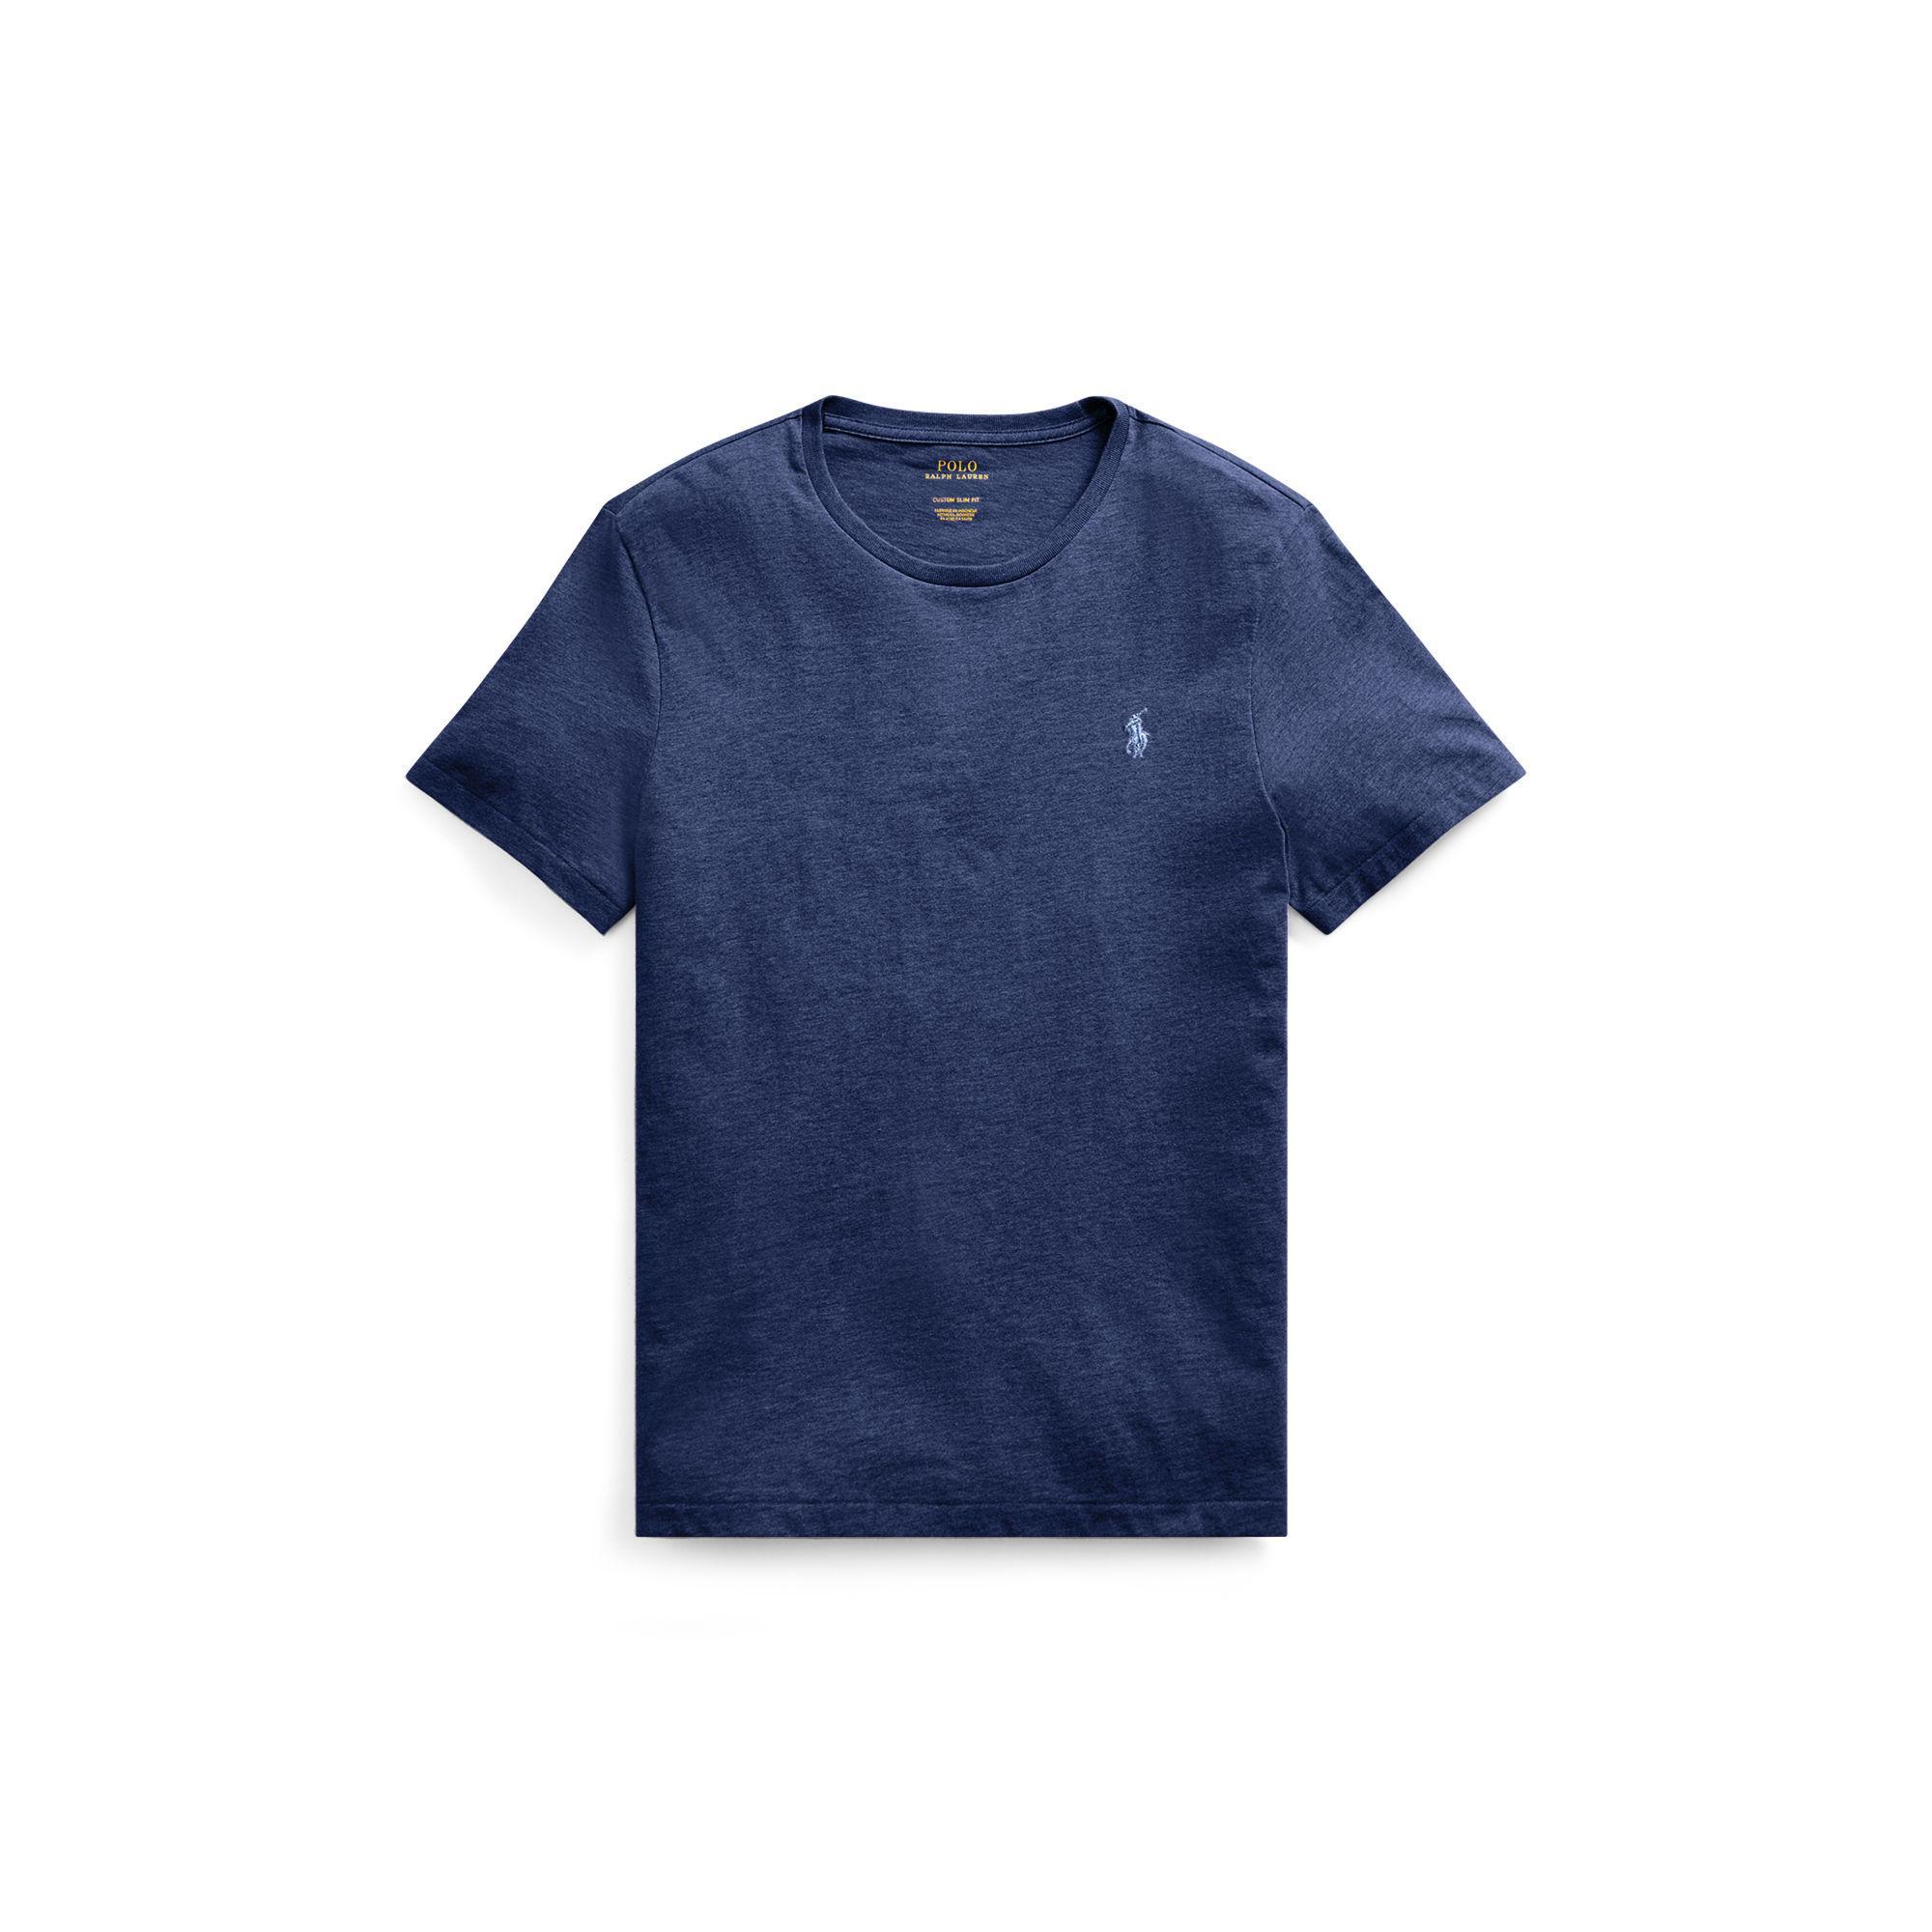 polo ralph lauren custom slim fit cotton t shirt in blue